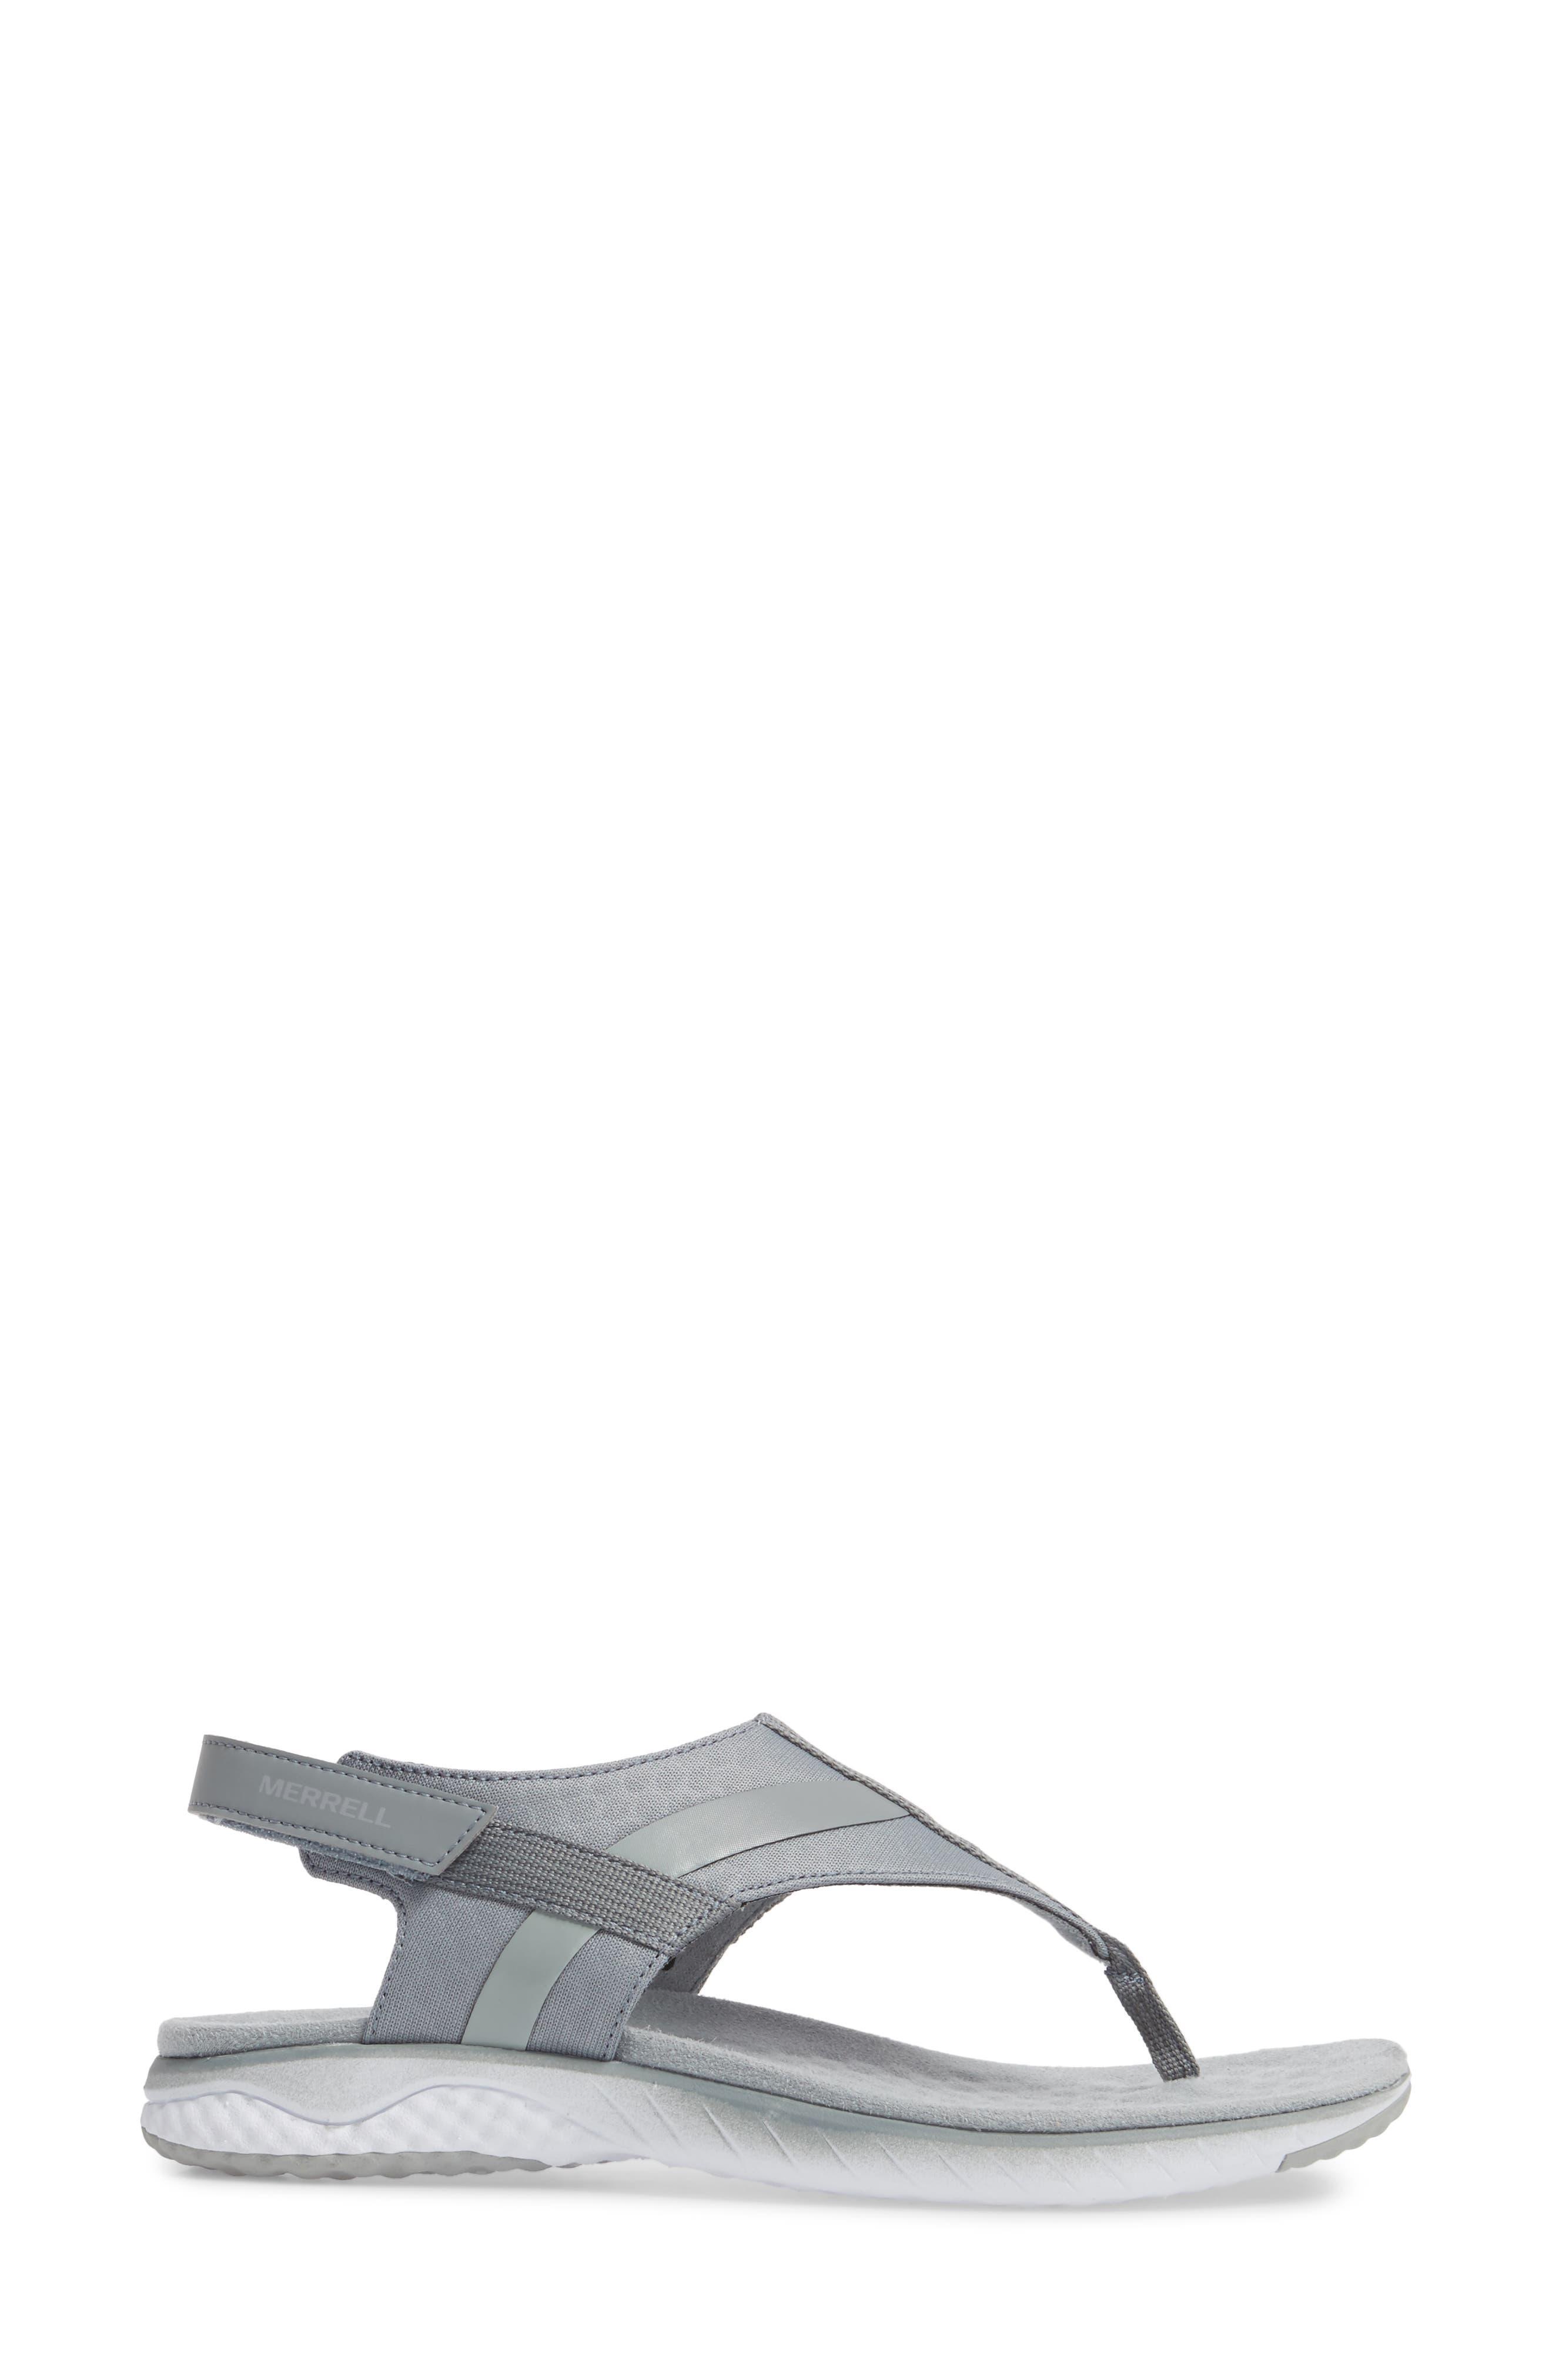 1SIX8 Linna Slide Air Cushion+ Sandal,                             Alternate thumbnail 10, color,